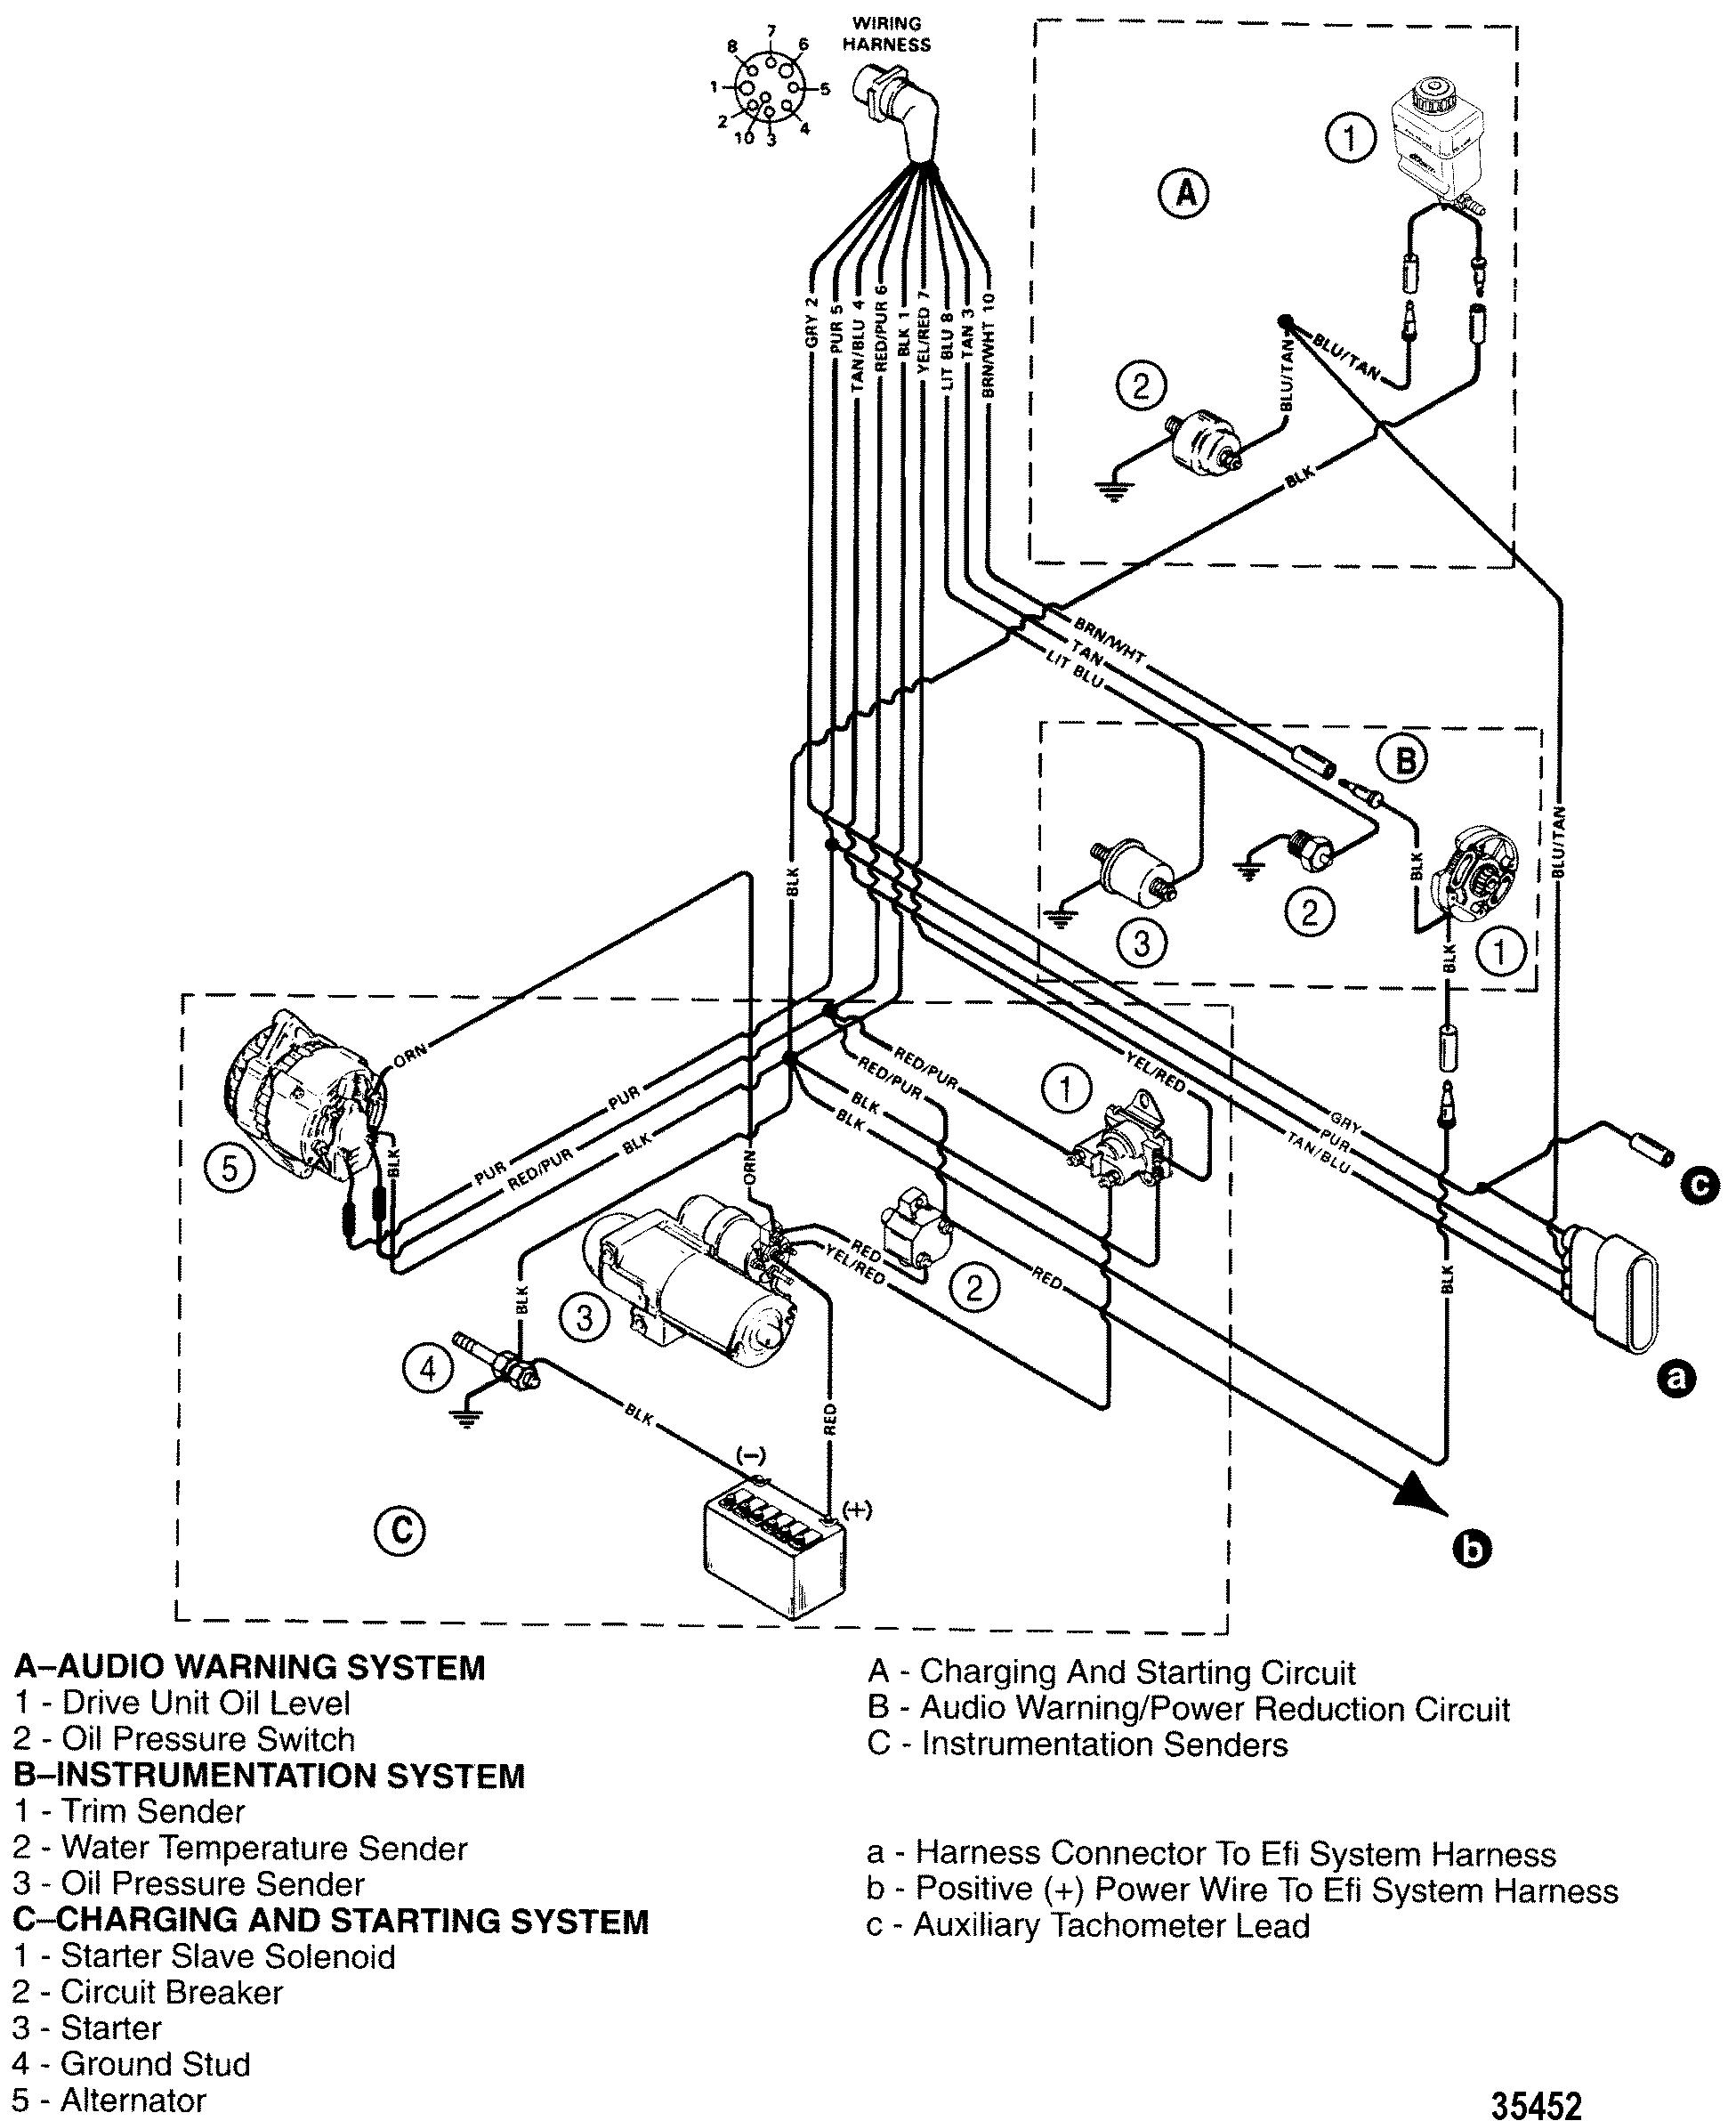 35452?resize\\\=665%2C812\\\&ssl\\\=1 viper 350 plus wiring diagram wiring diagrams viper 350 plus wiring diagram at soozxer.org